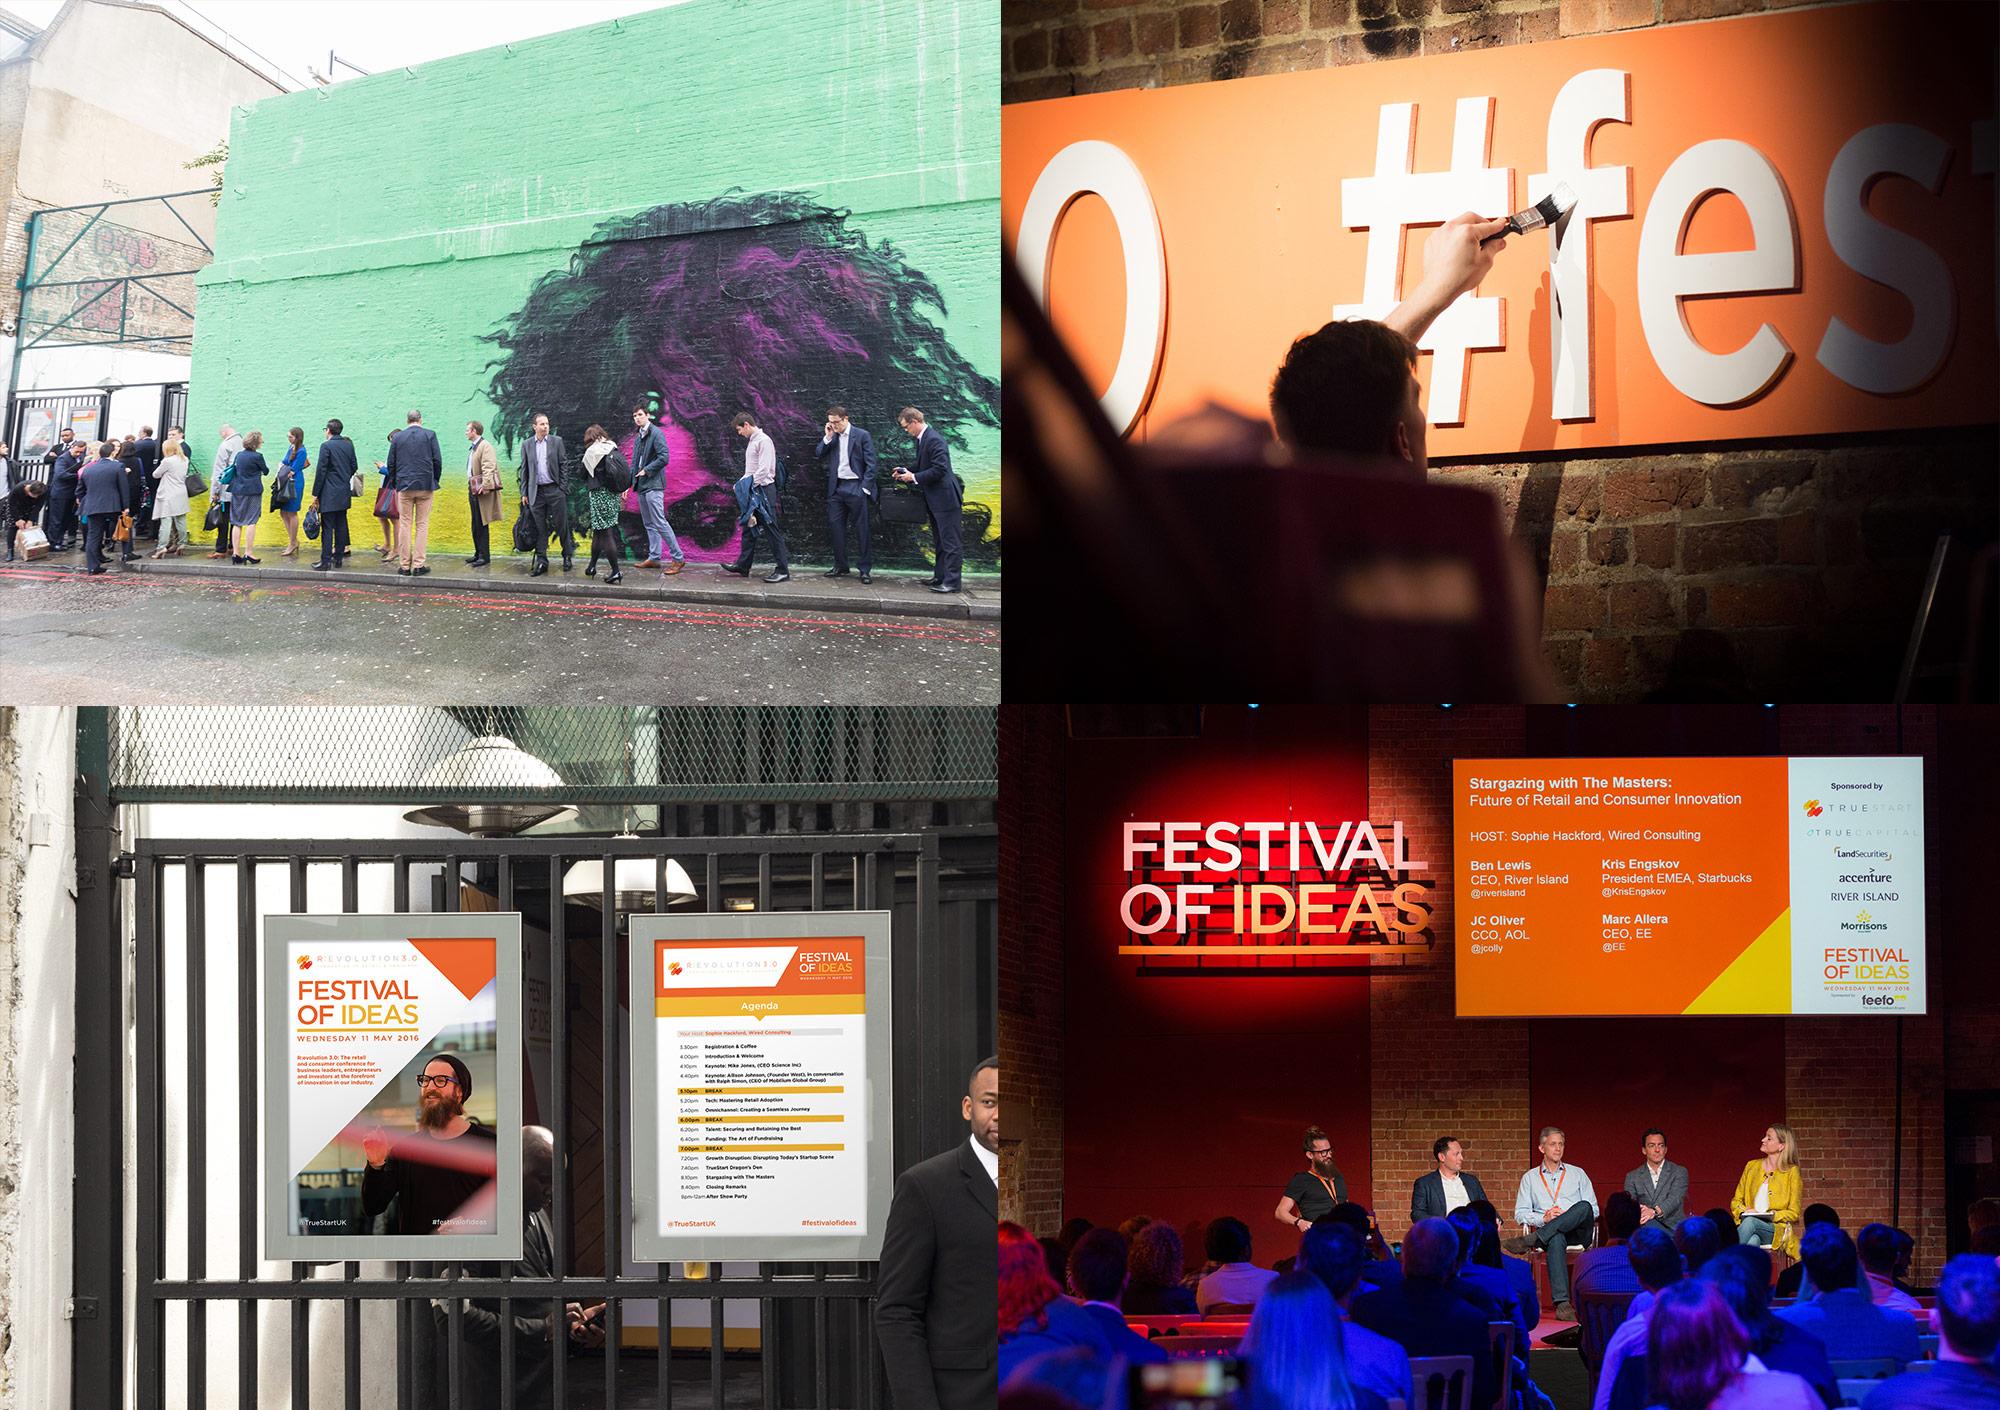 Festival-of-Ideas-2